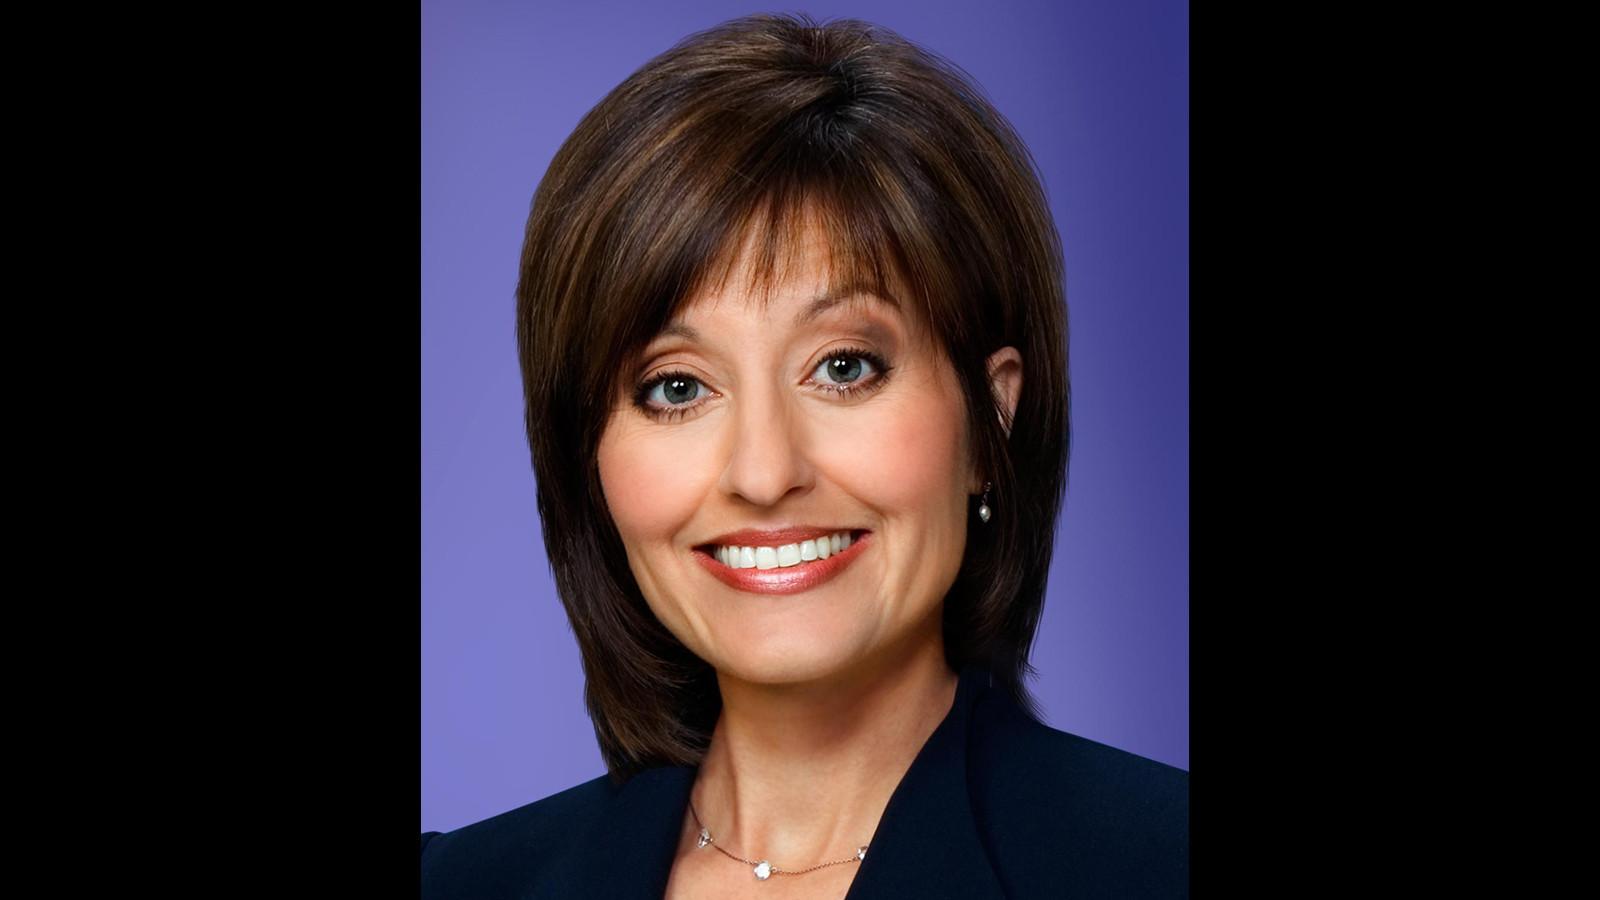 KCBSKCALs Sylvia Lopez to leave anchor desk for public health career  LA Times